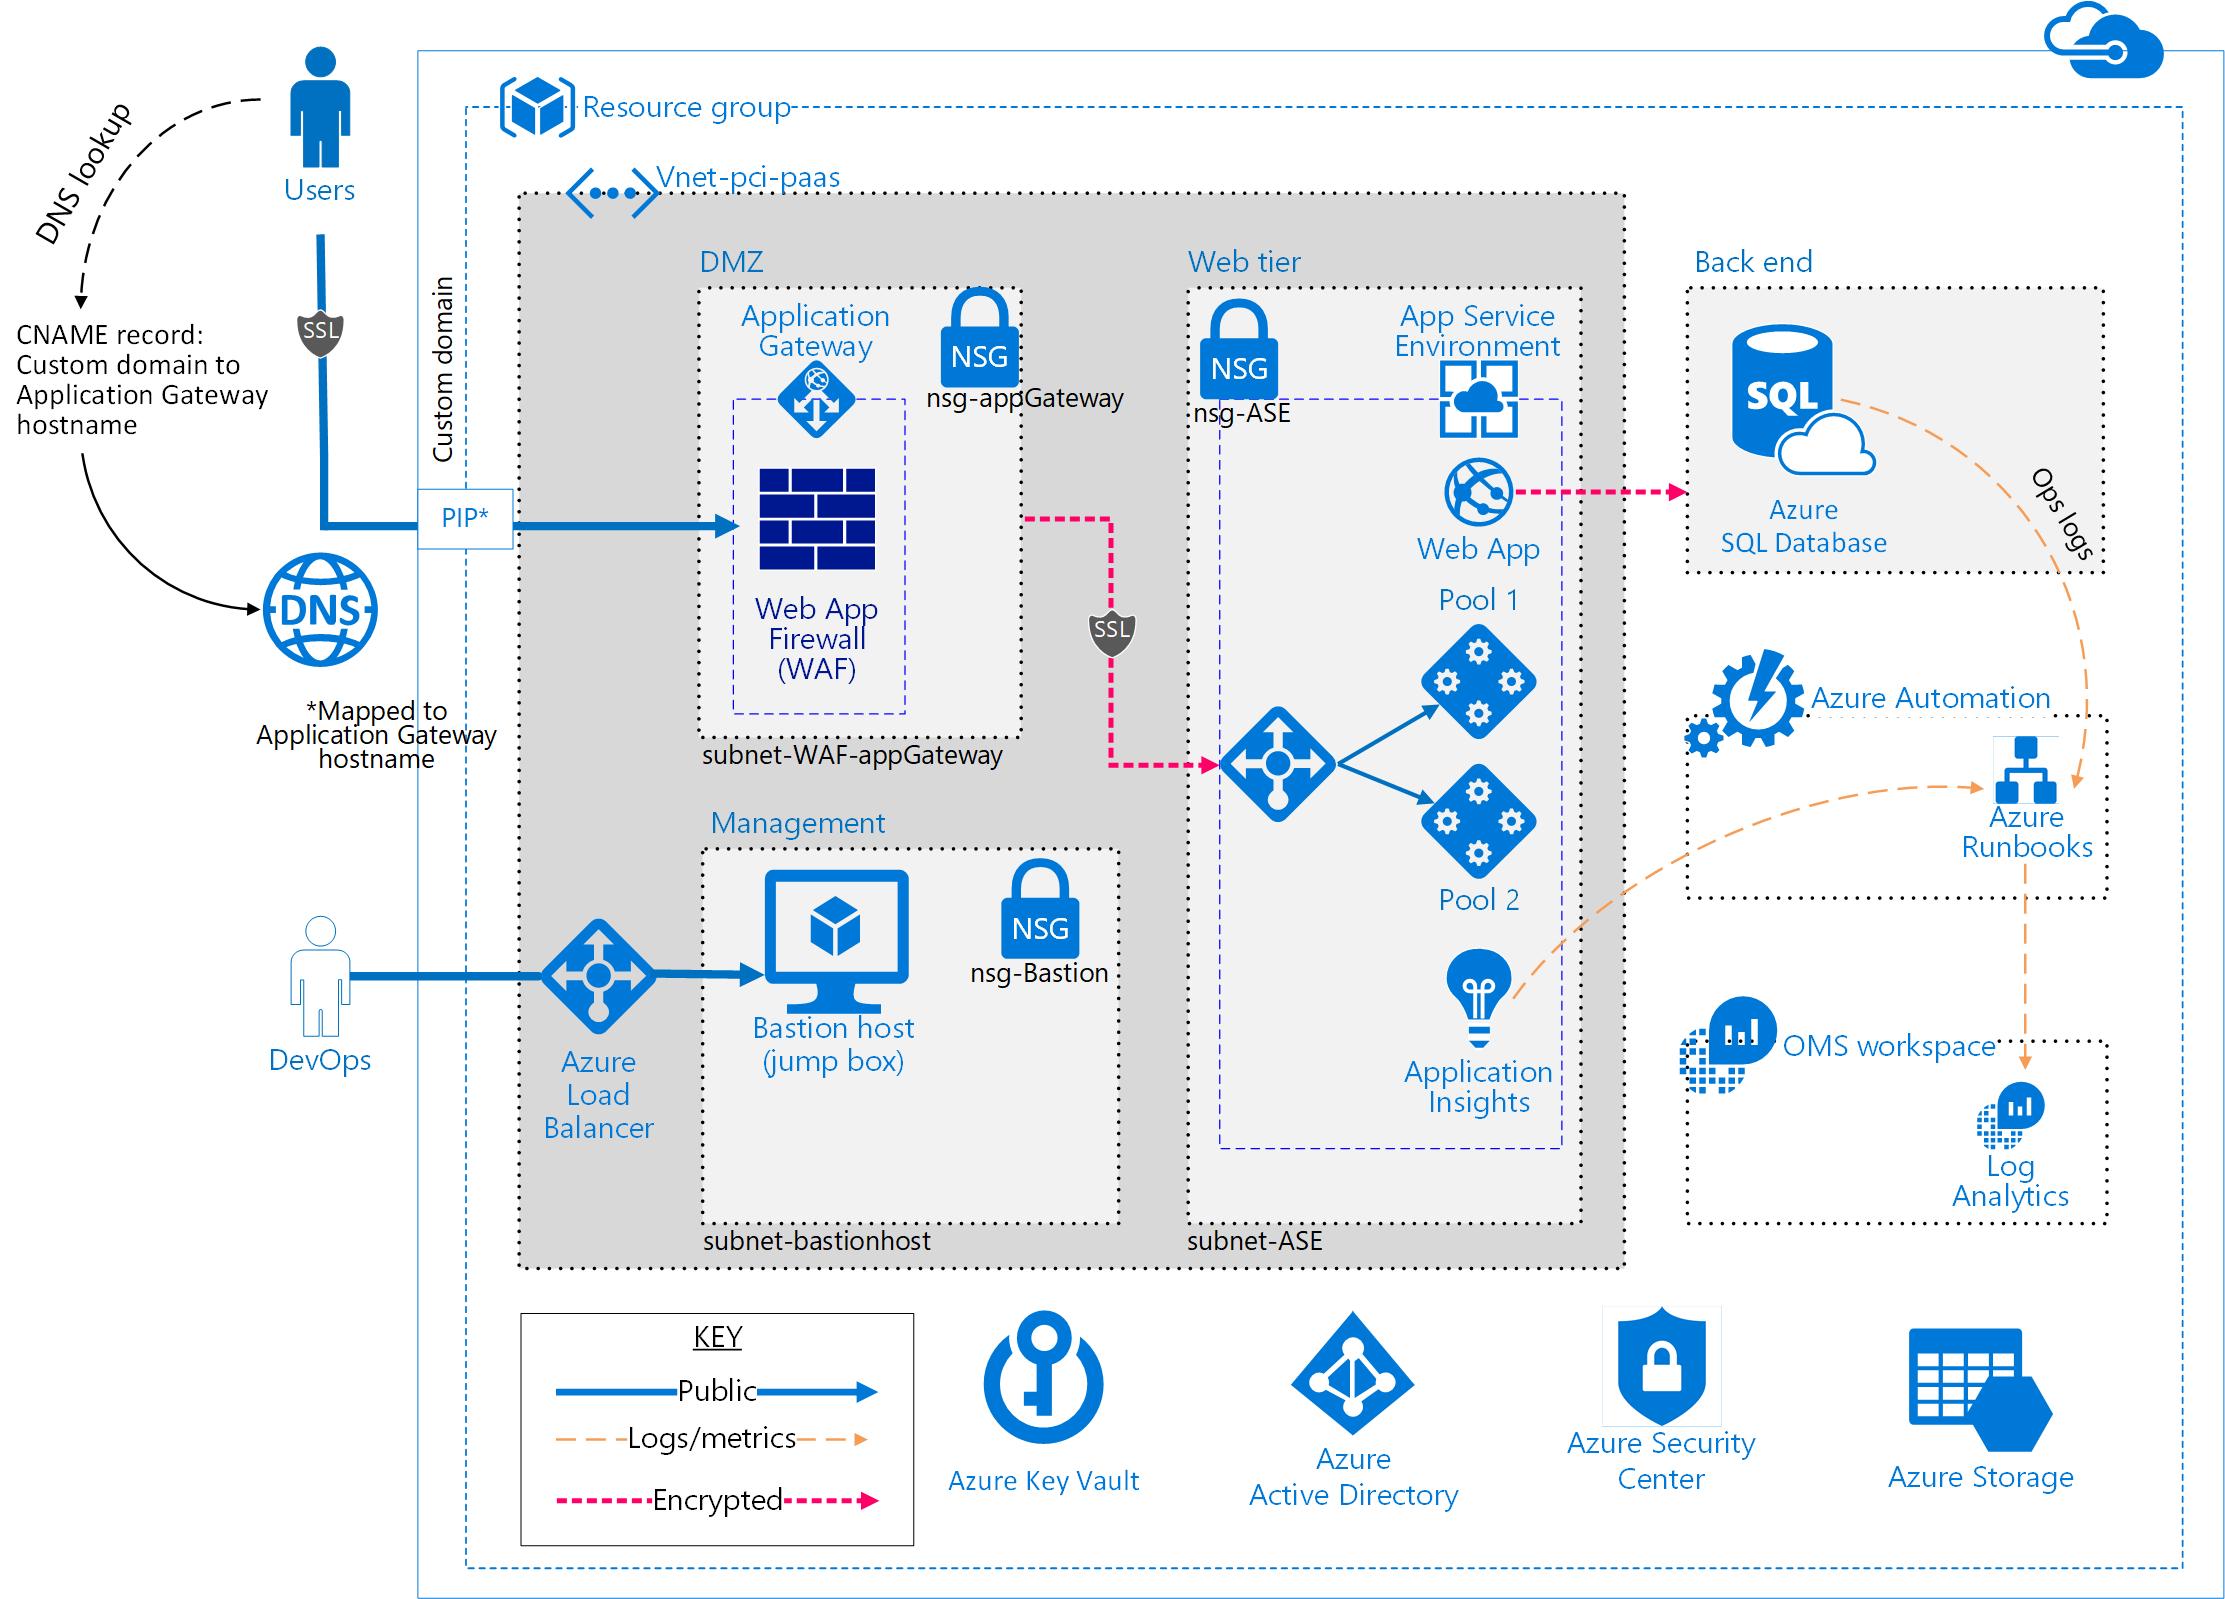 Azure Security And Compliance Blueprint Entornos De Procesamiento De Pagos Compatibles Con Pci Software Development Technical Documentation Document Templates